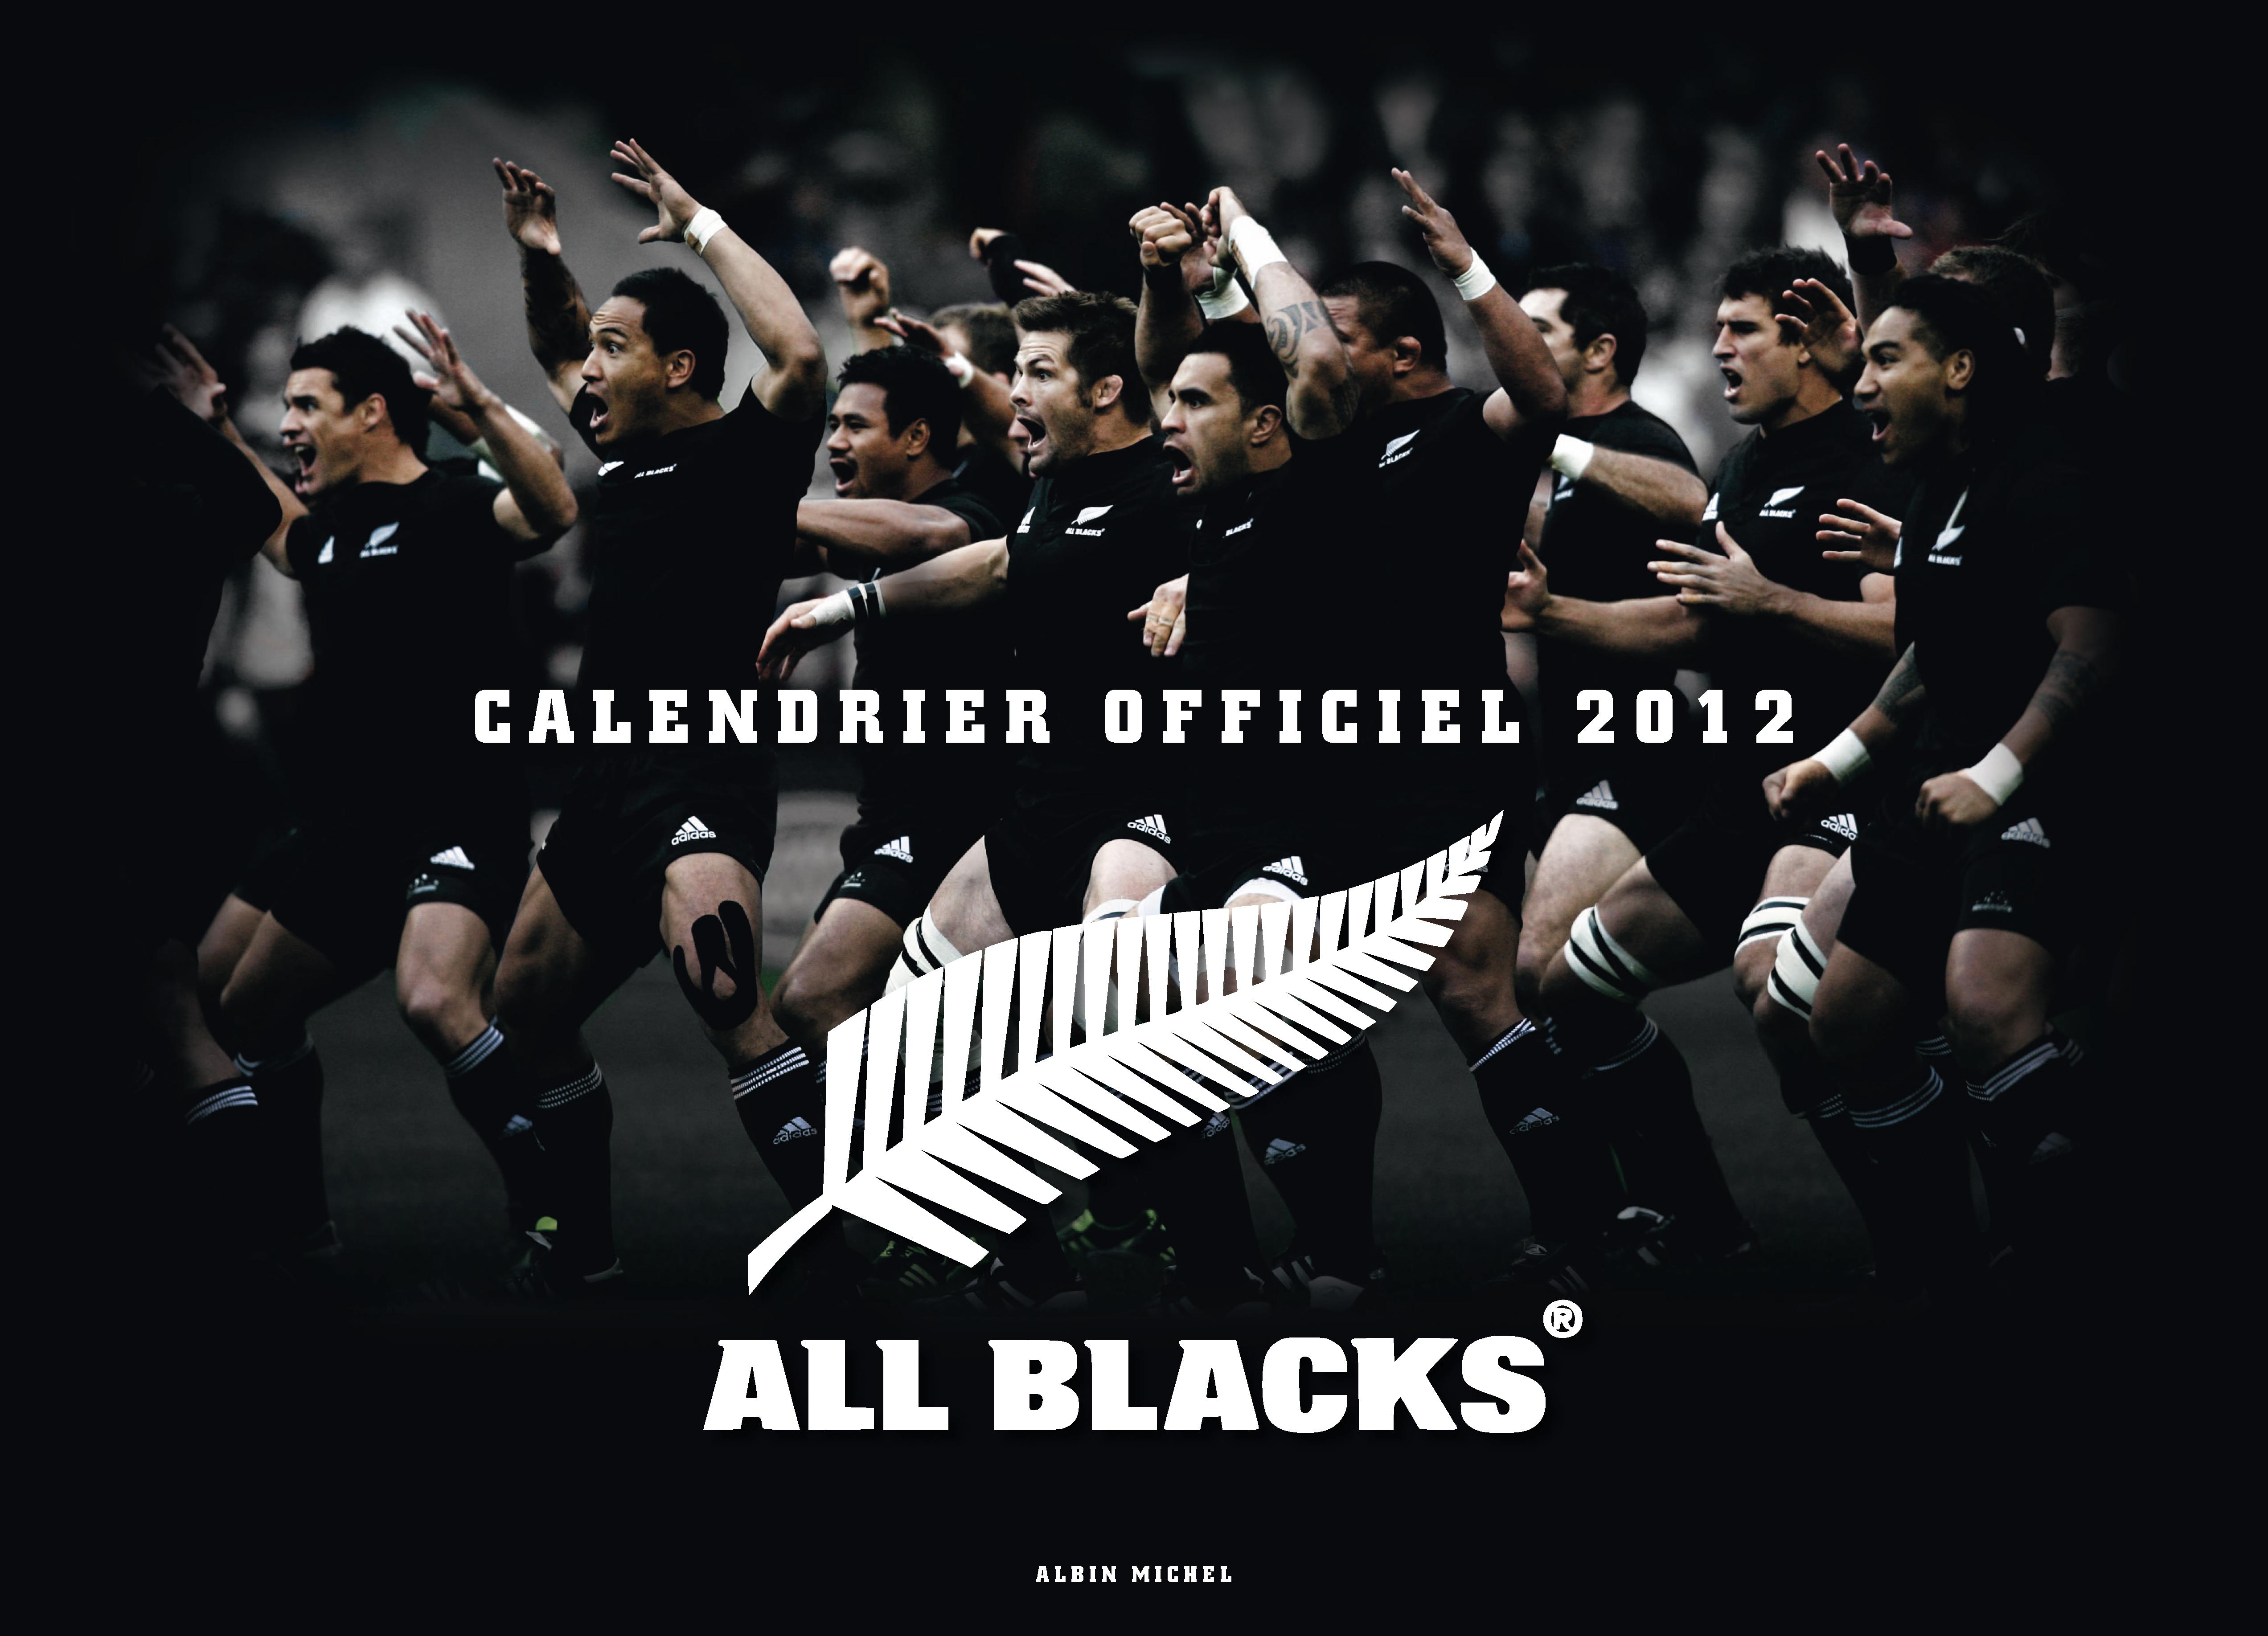 All Blacks wallpaper 105157 5089x3672